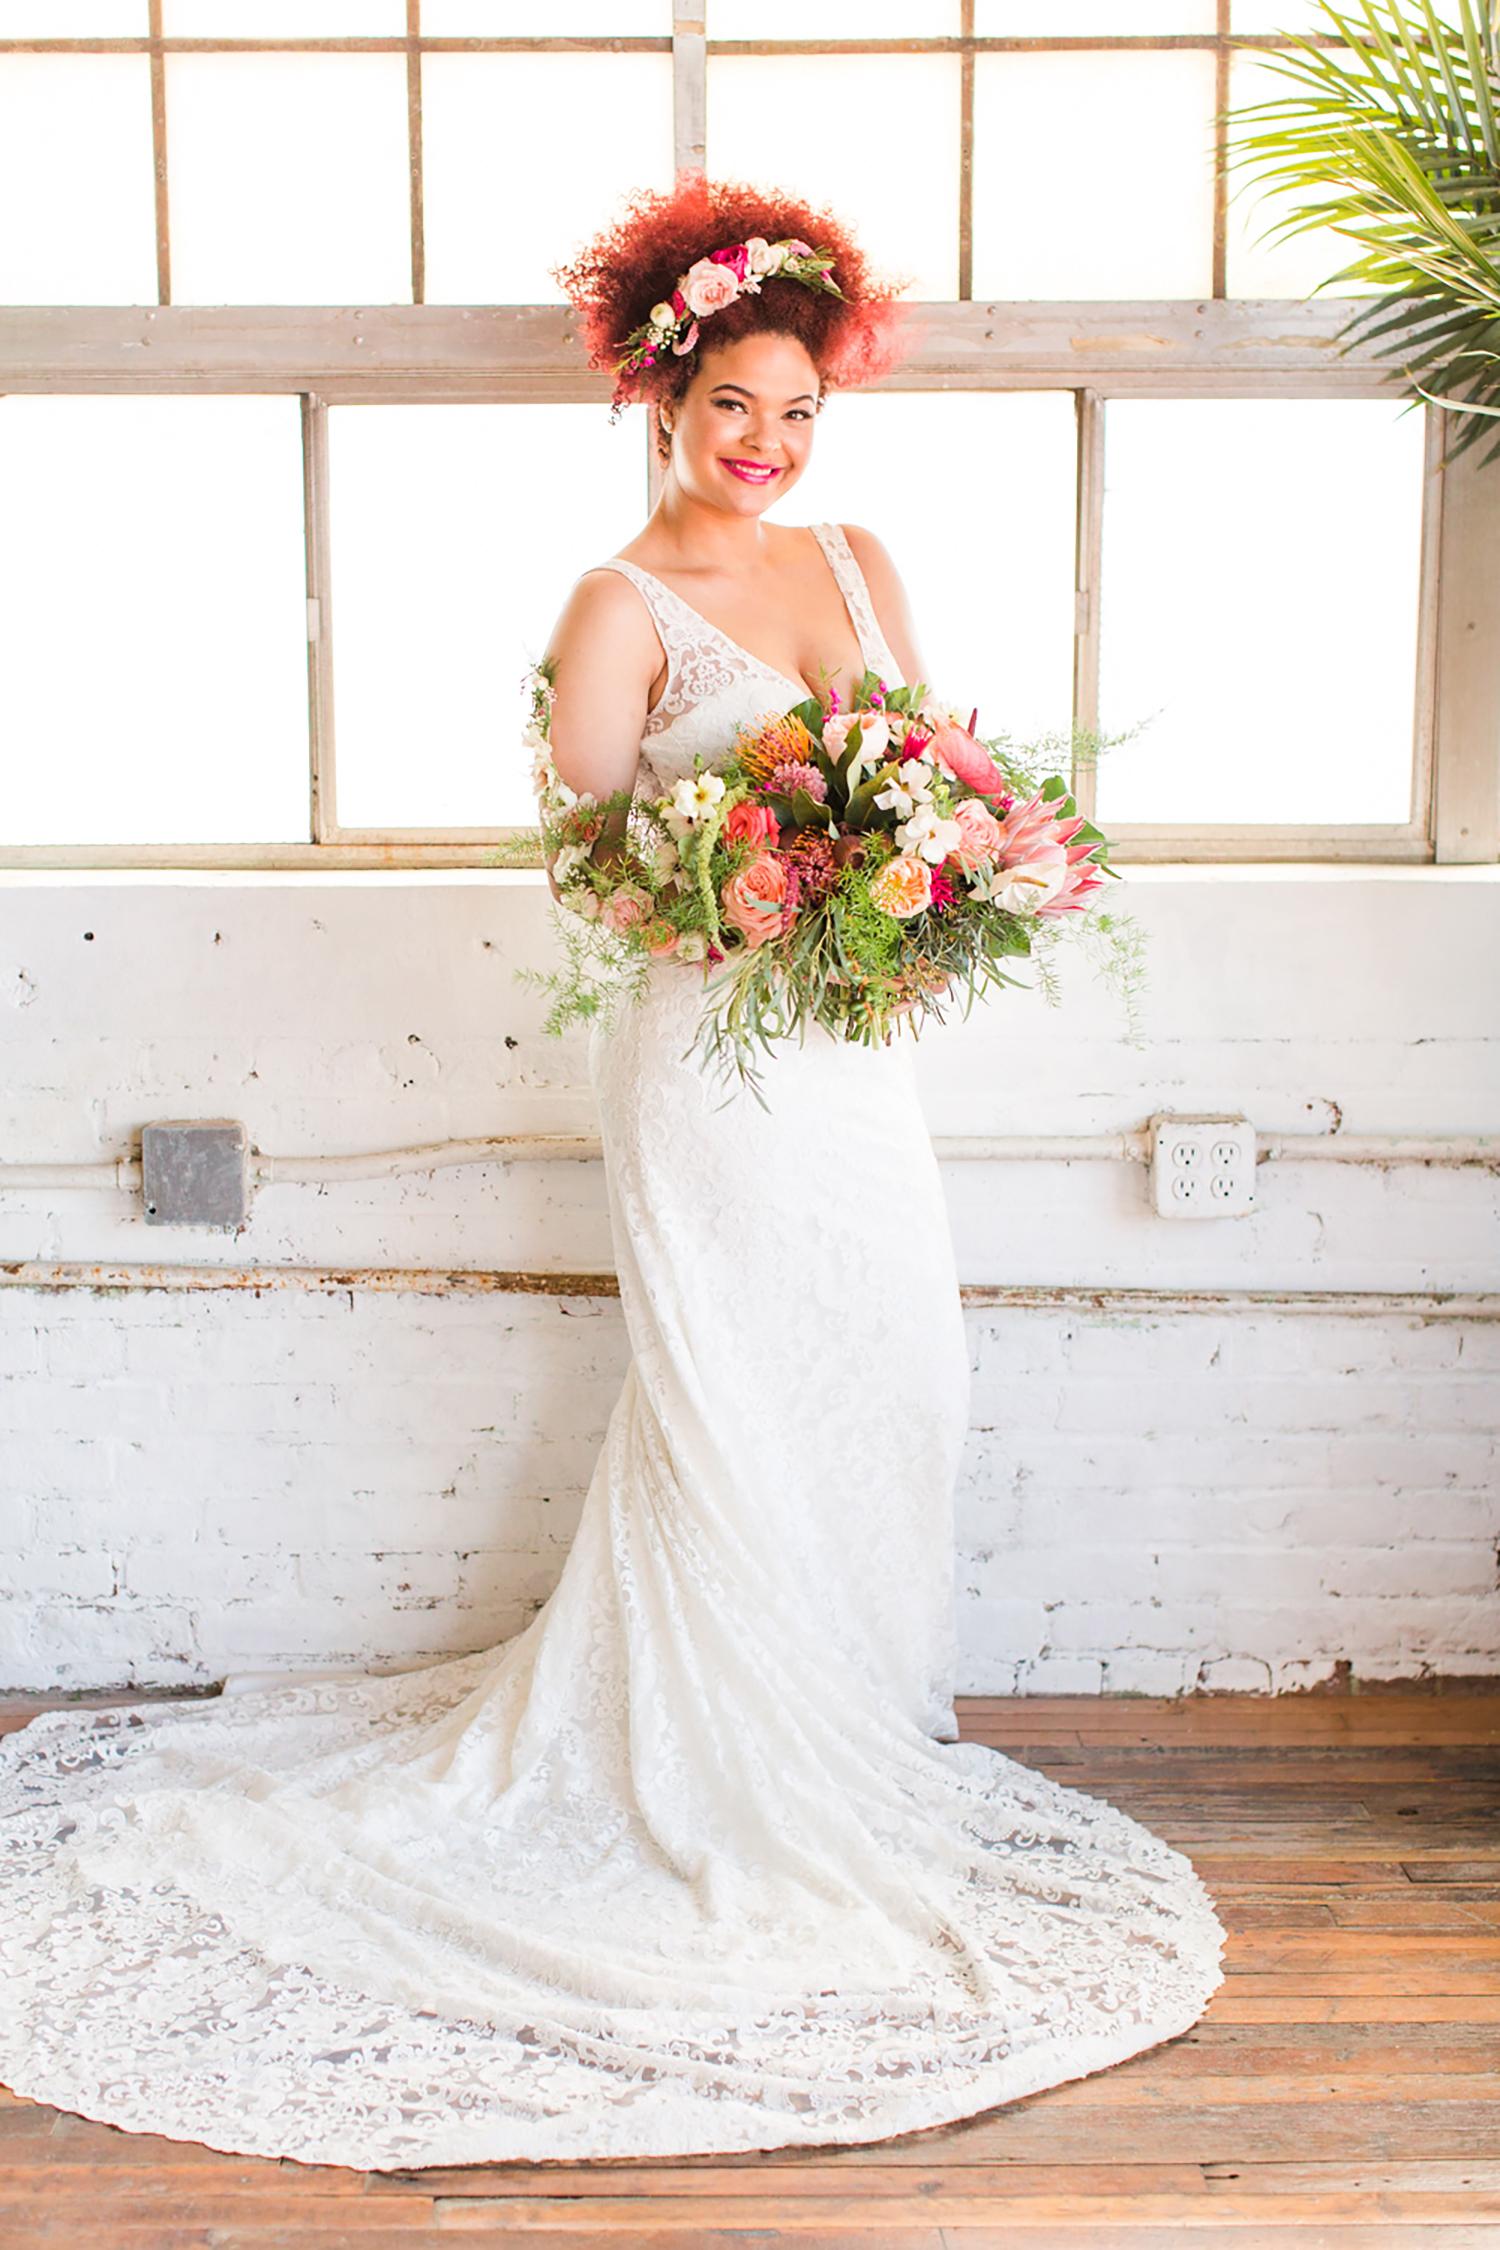 tropical-wedding-inspiration-ct-wedding-planner-18.jpg